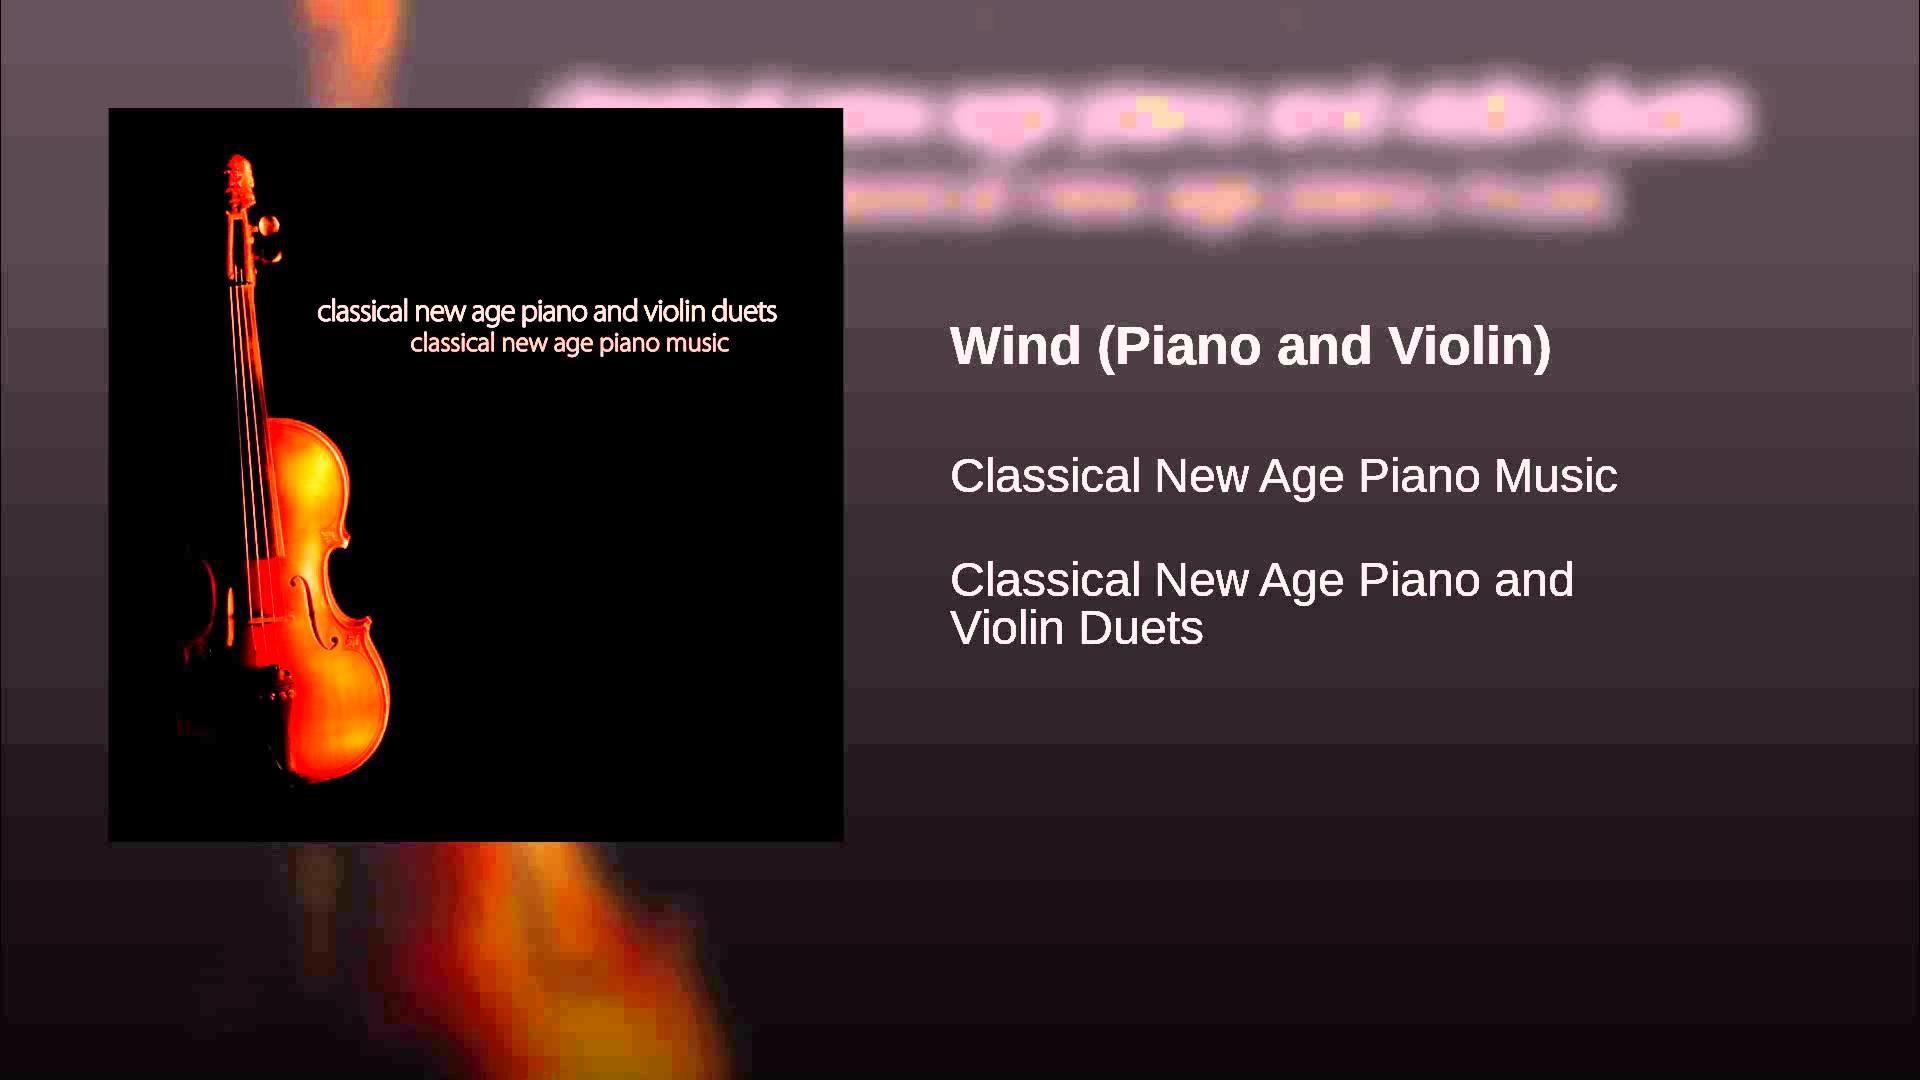 Wind (Piano and Violin)